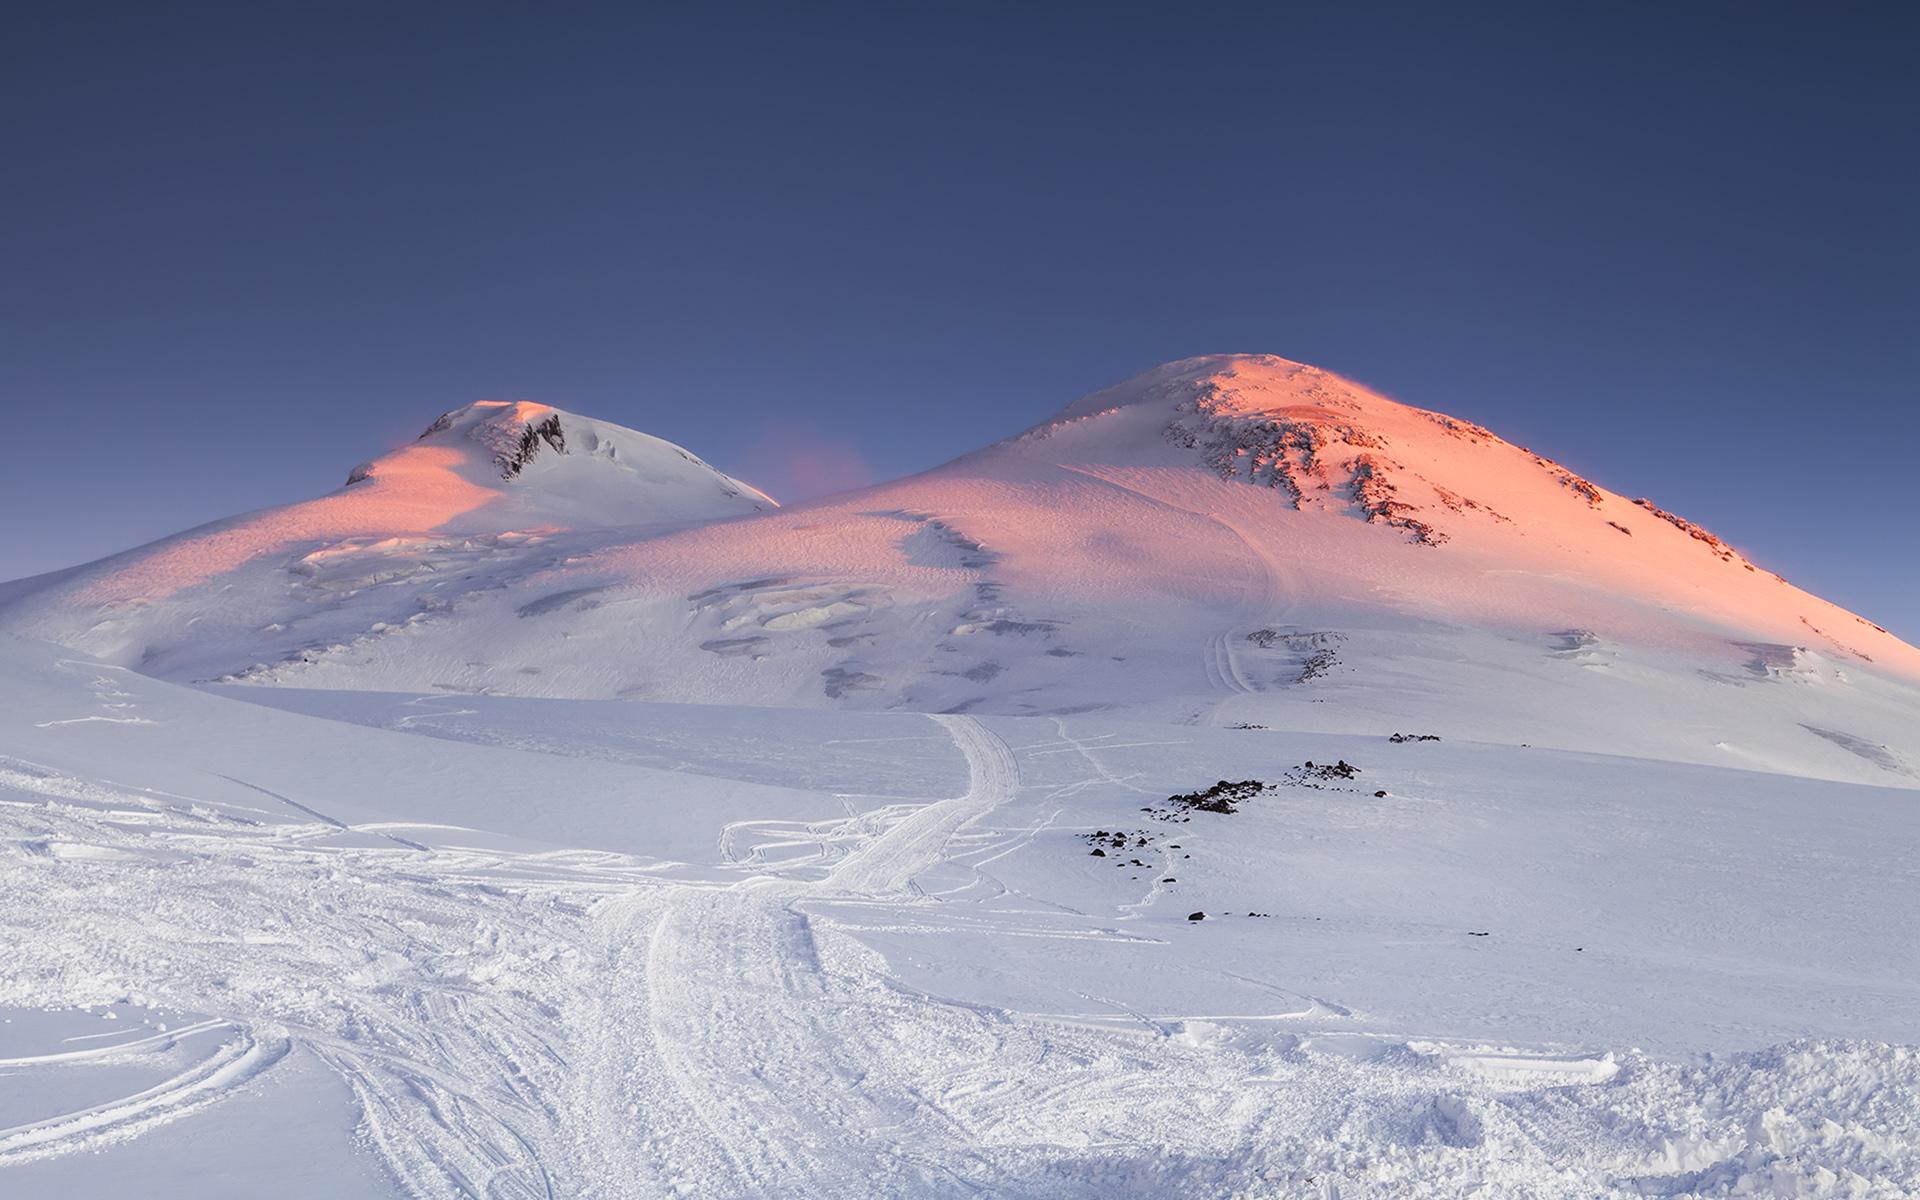 neige-et-ski-montagne-et-altitude